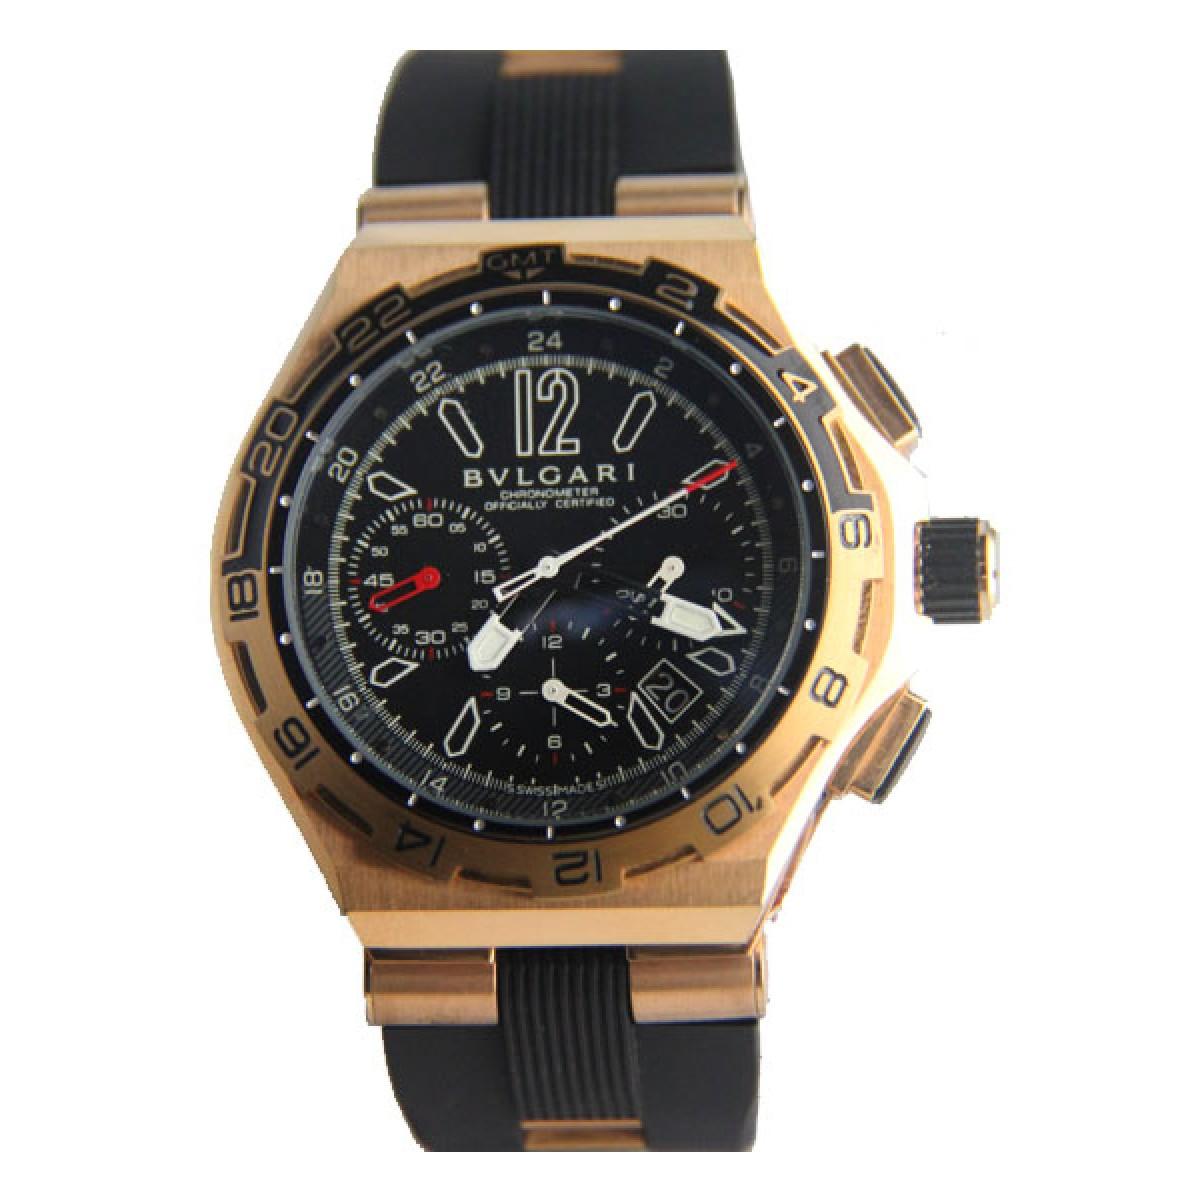 e90a6db3e64 Relógio Réplica Bulgari X Pro Gold